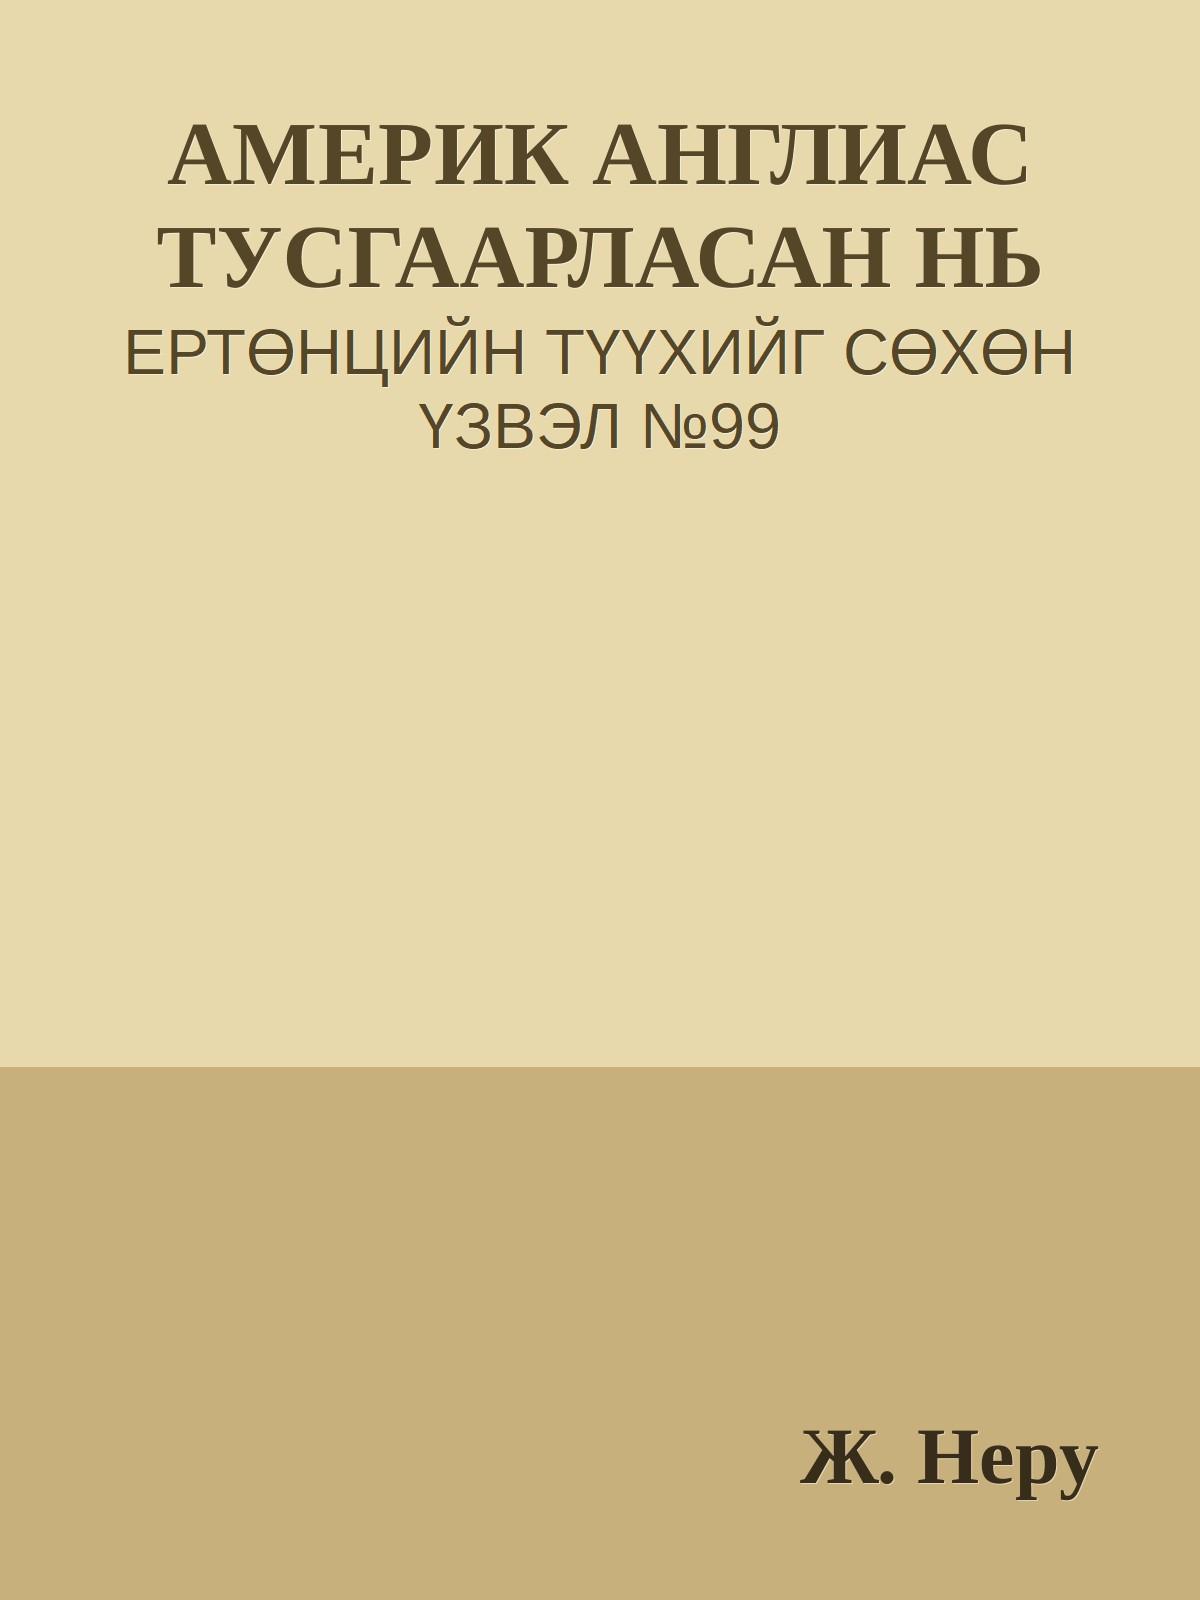 АМЕРИК АНГЛИАС ТУСГААРЛАСАН НЬ